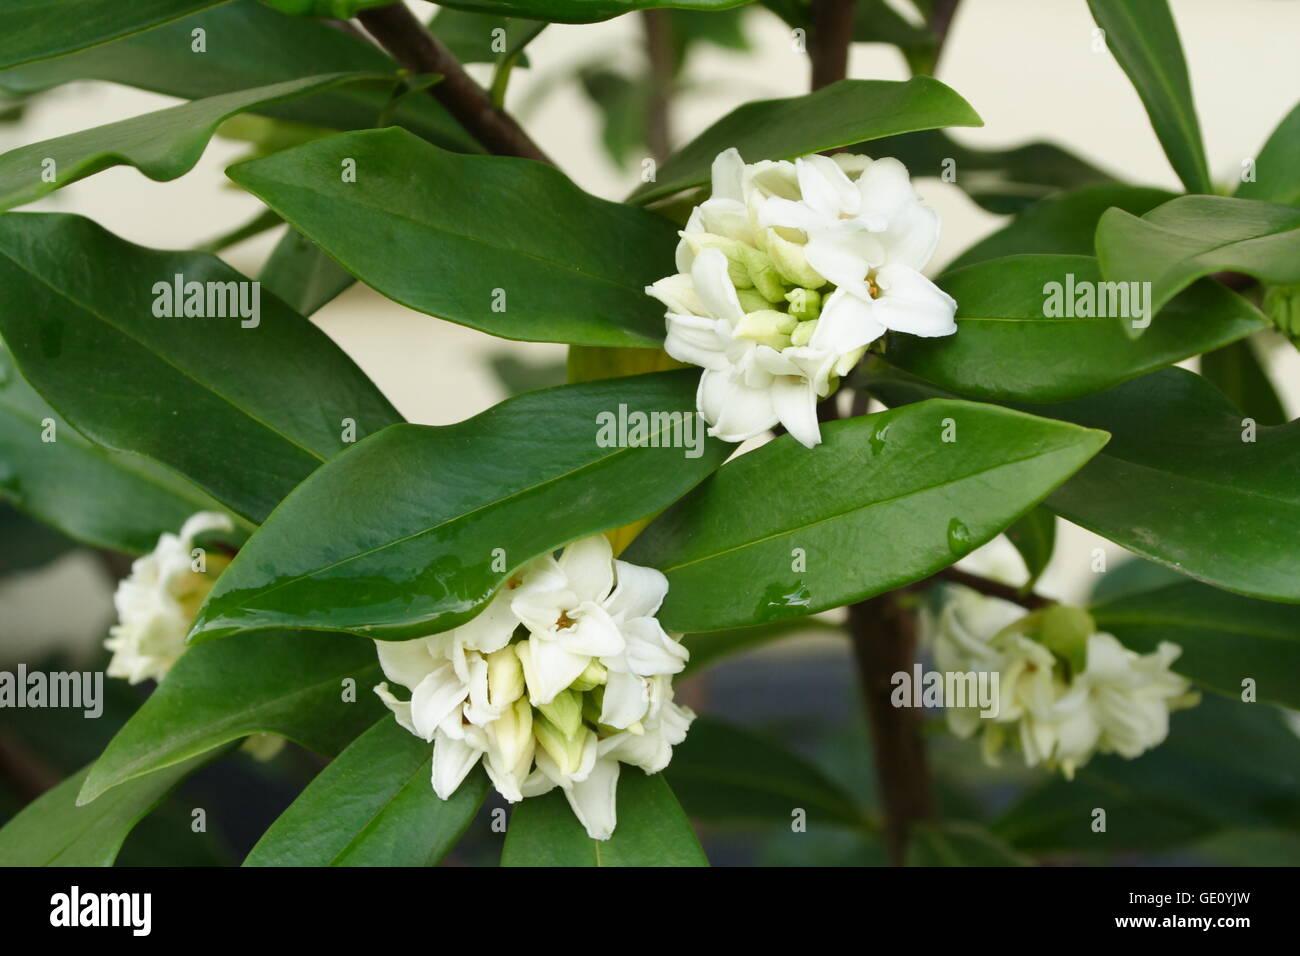 Daphne odora alba - Stock Image